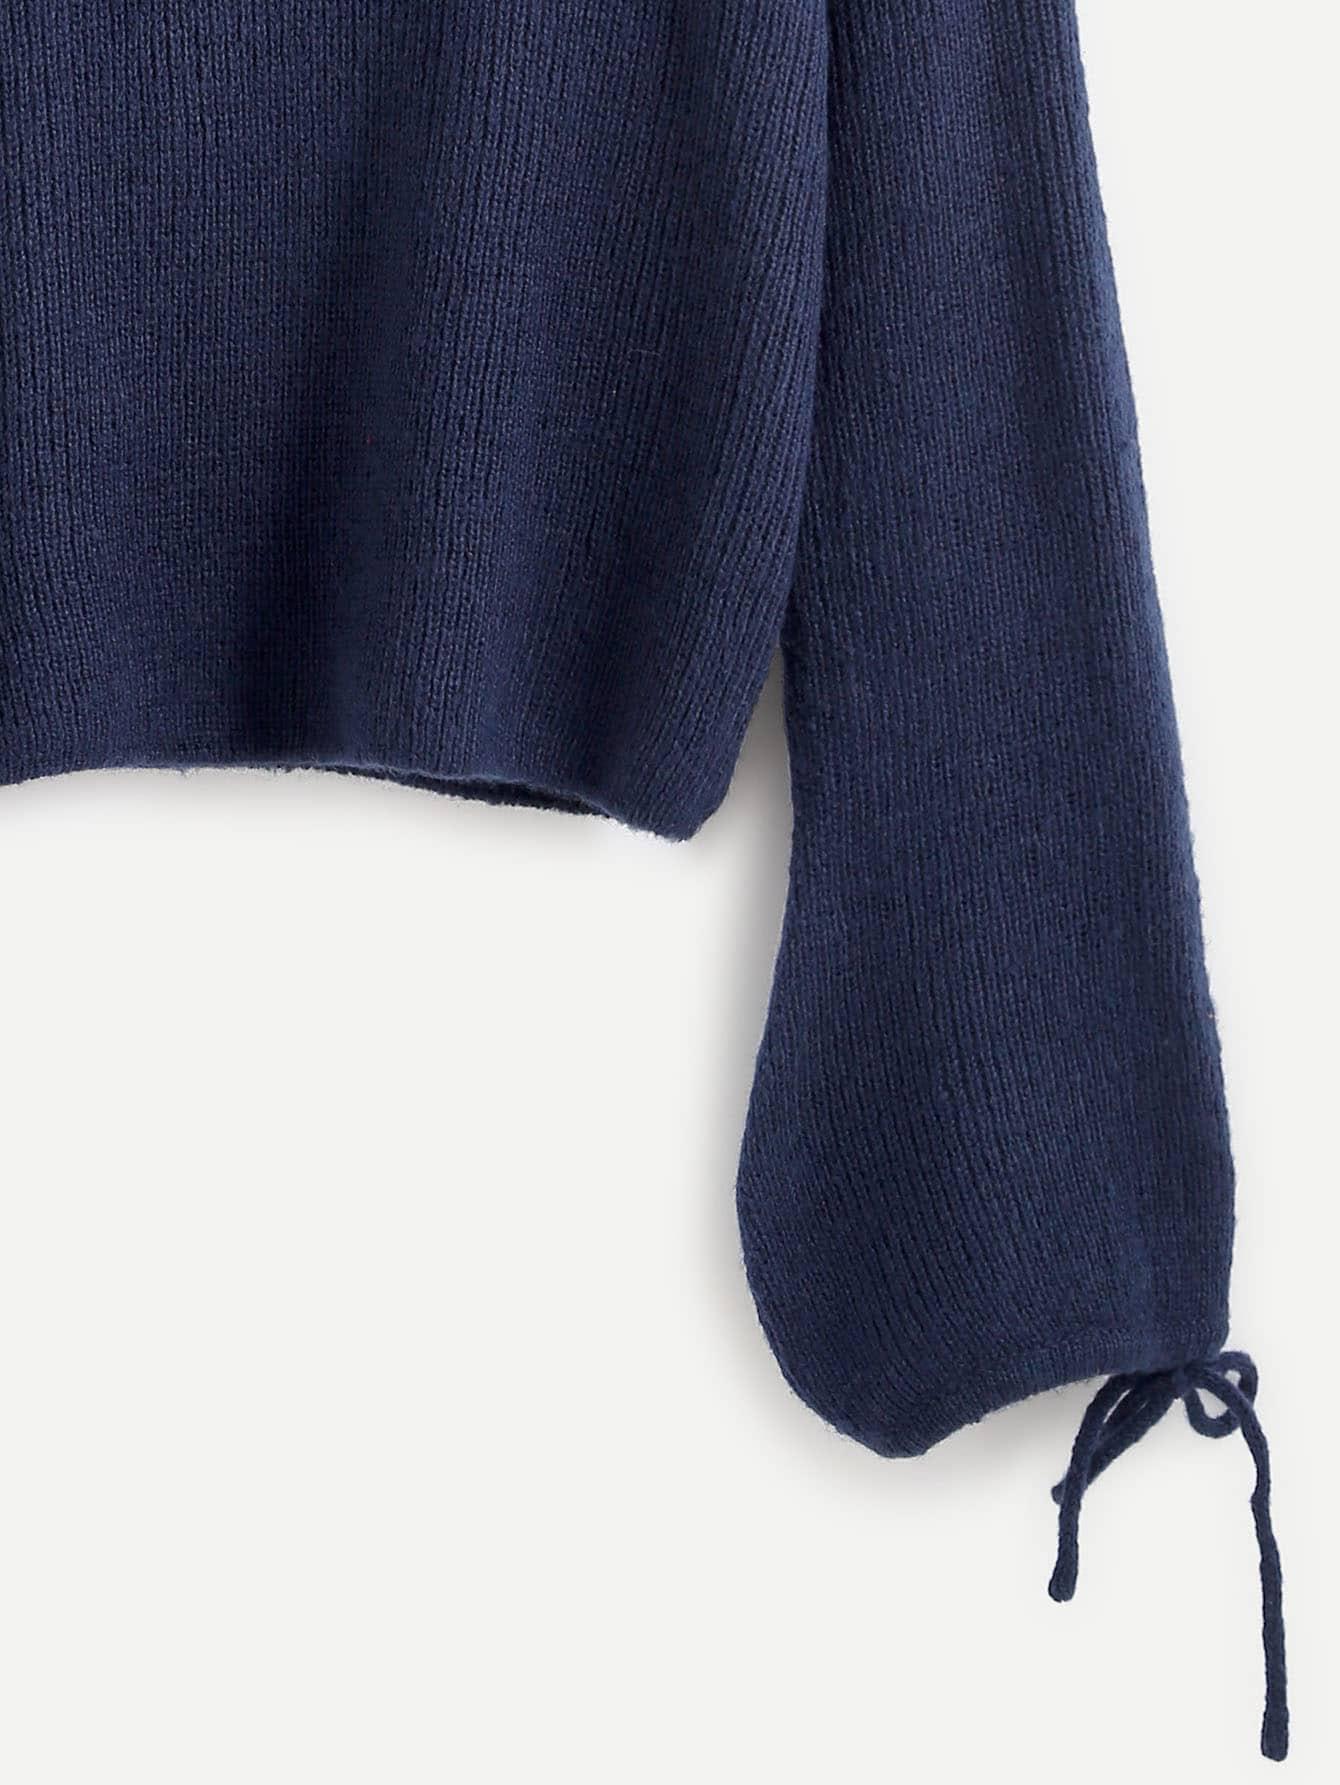 sweater160920464_2